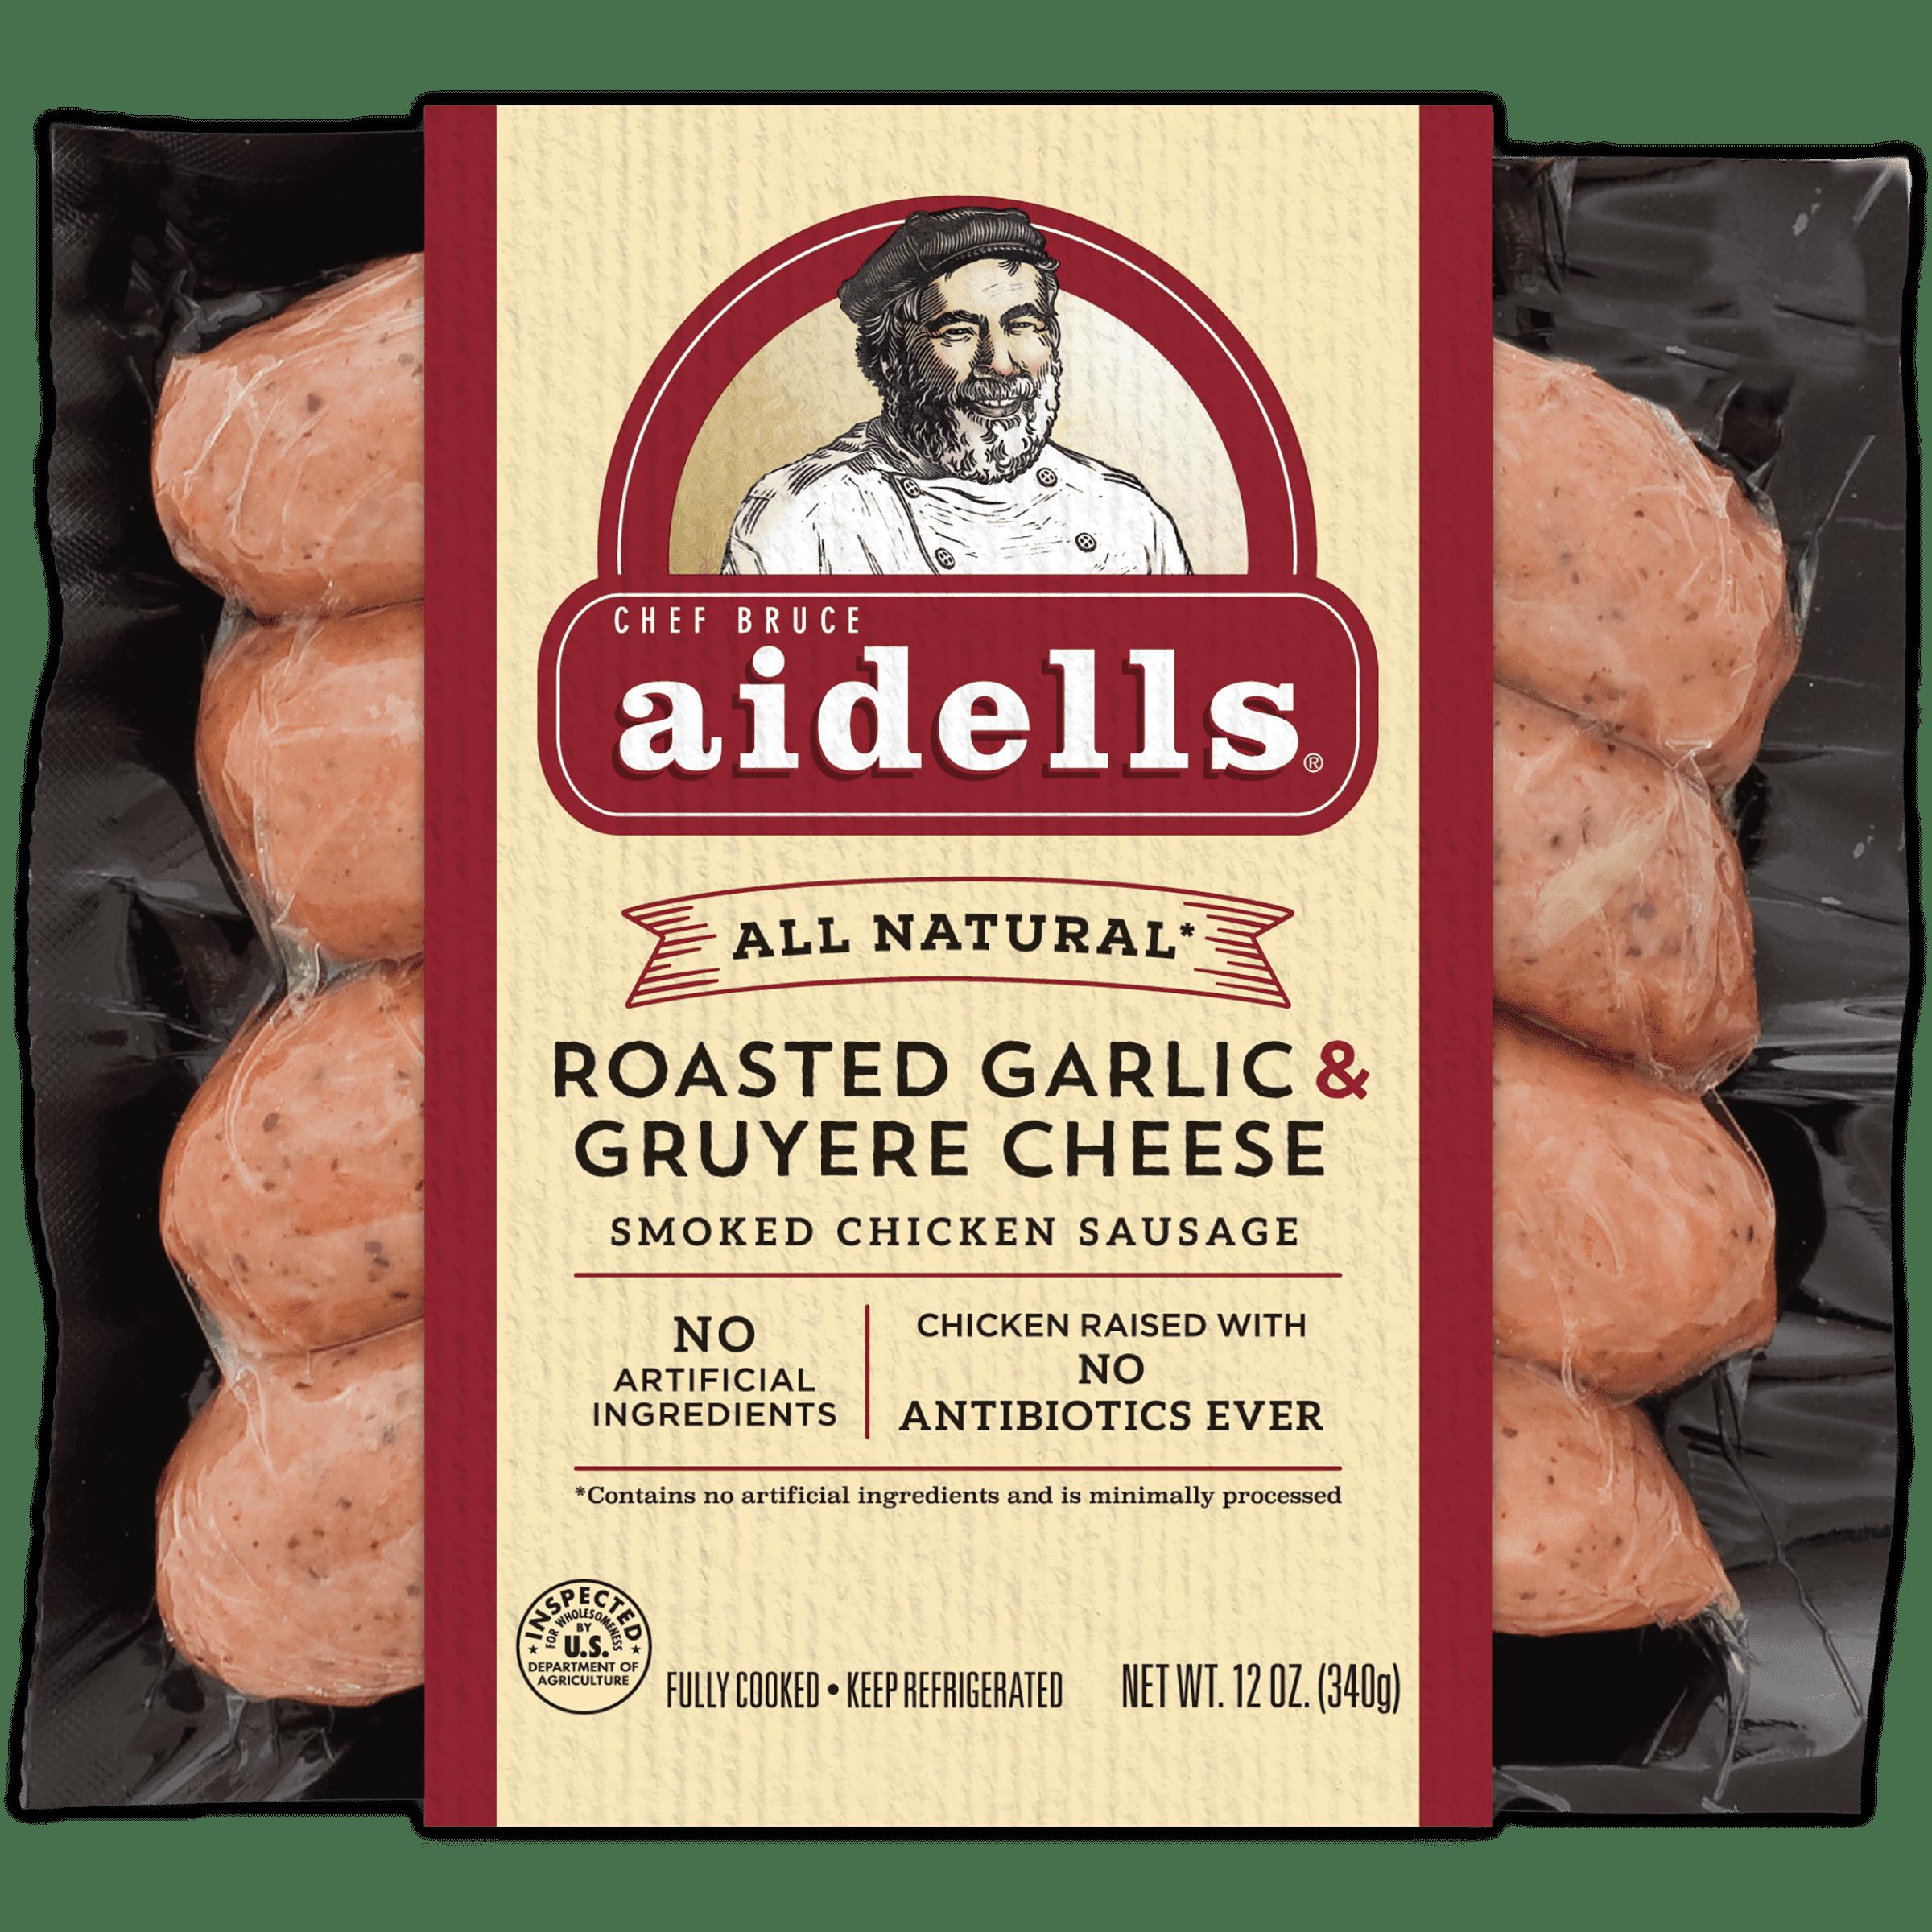 Aidells Roasted Garlic & Gruyere Cheese Smoked Chicken Sausage, 12 Oz., 4 Count